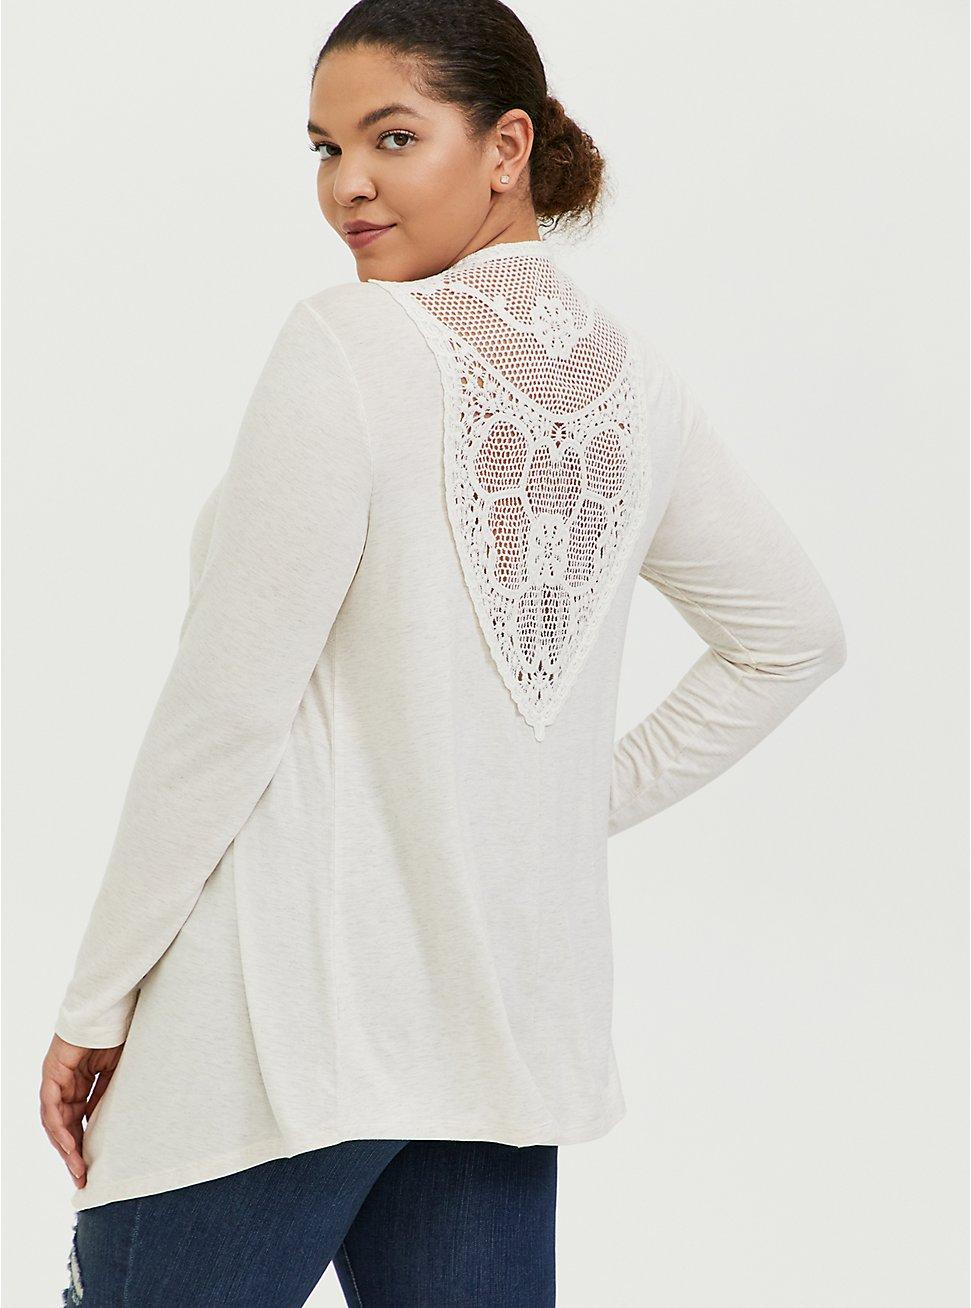 Super Soft Oatmeal Crochet Back Hi-Lo Cardigan, OATMEAL HEATHER, hi-res